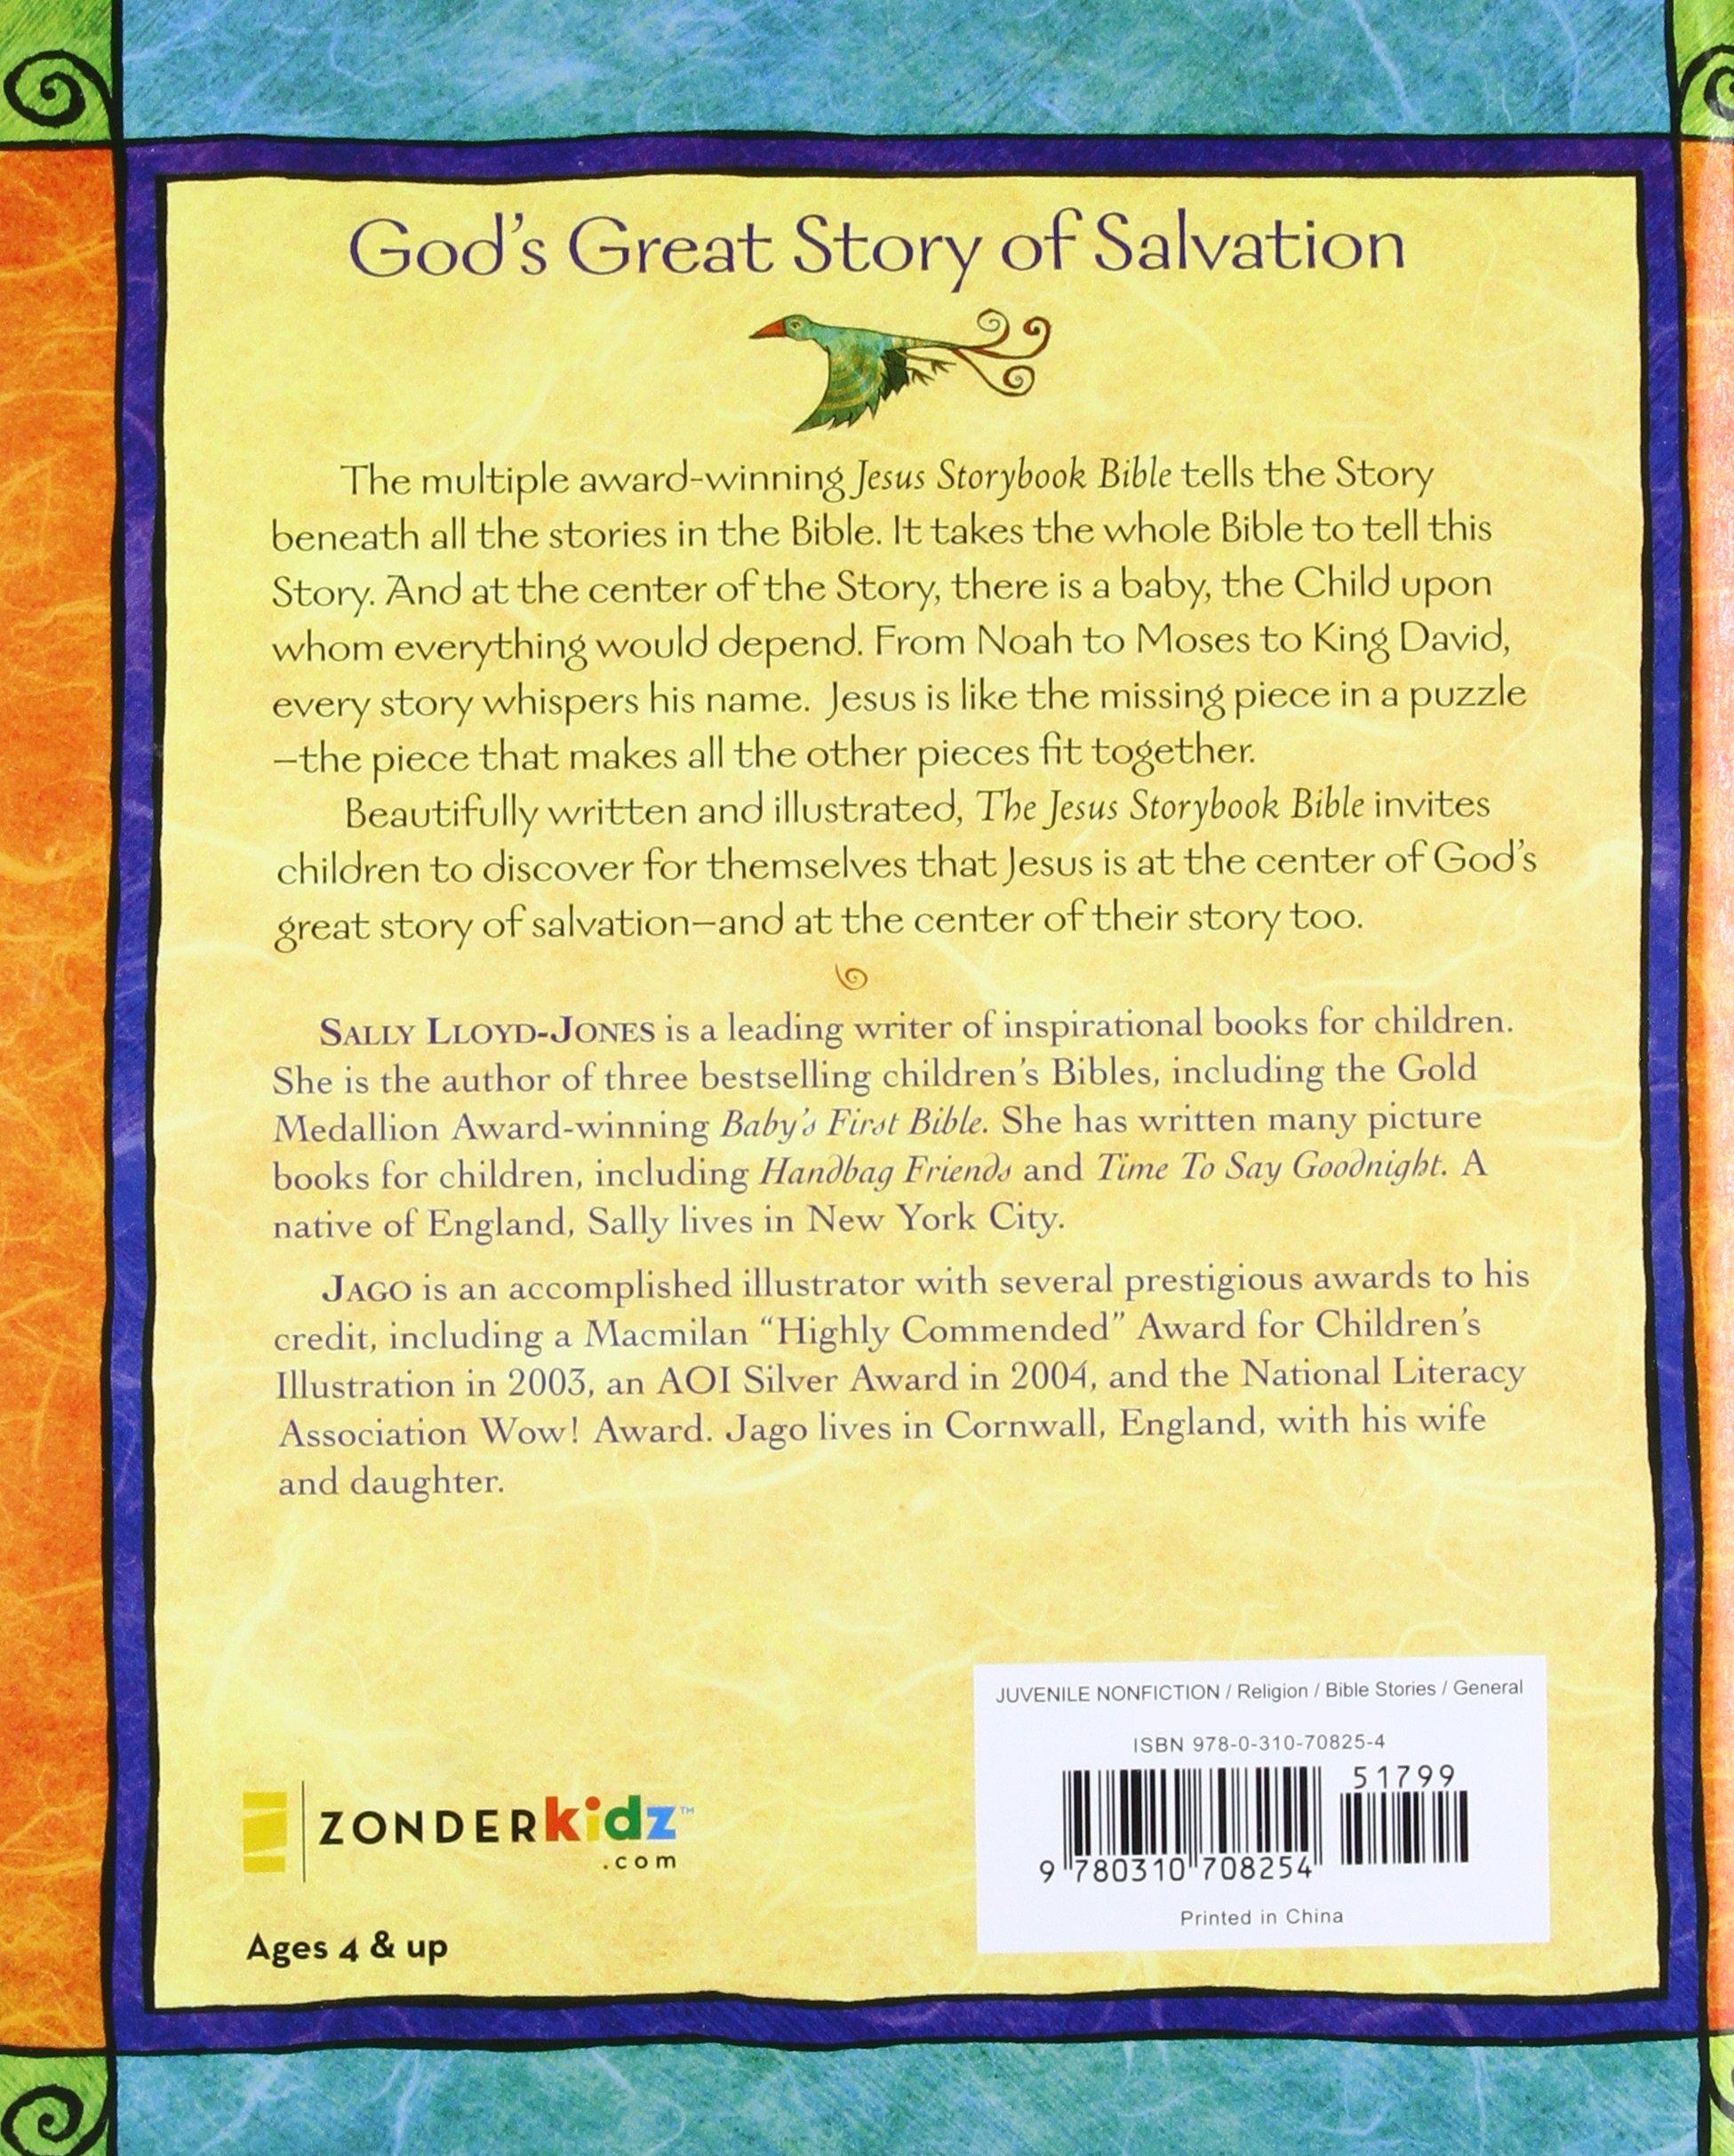 jesus-storybook-bible-2.jpg